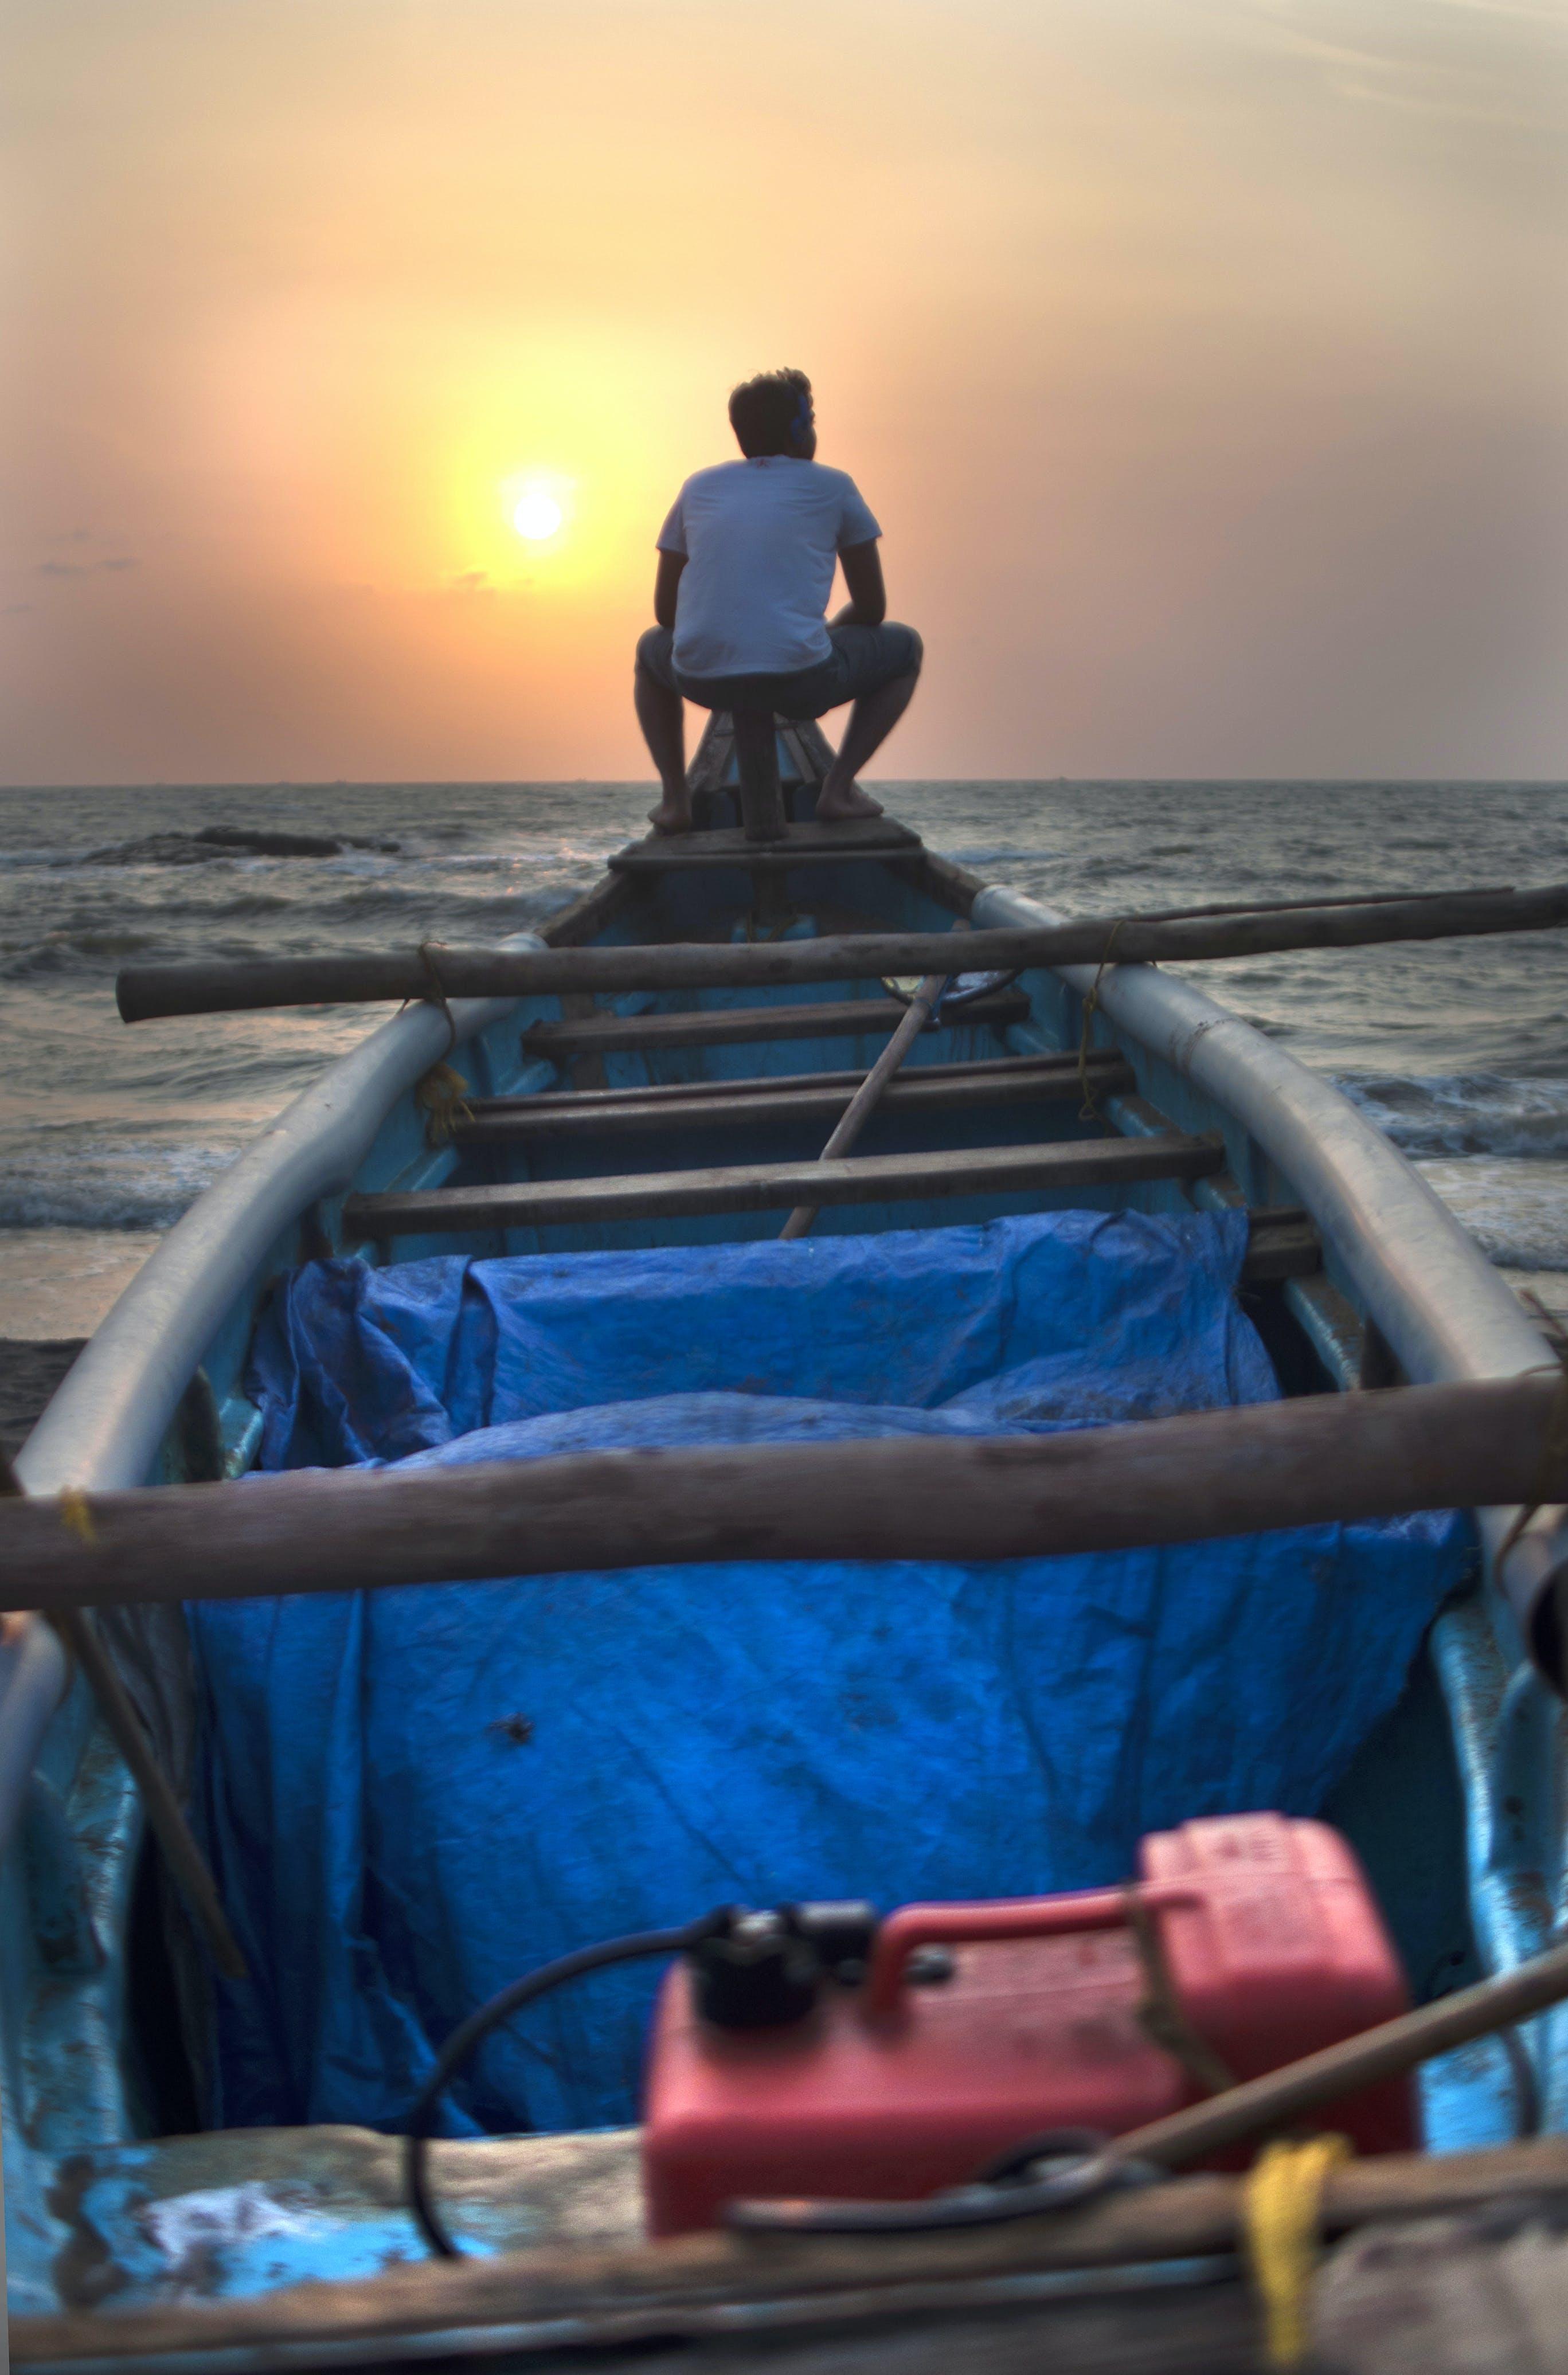 Free stock photo of beach, boat, fisherman, fishing